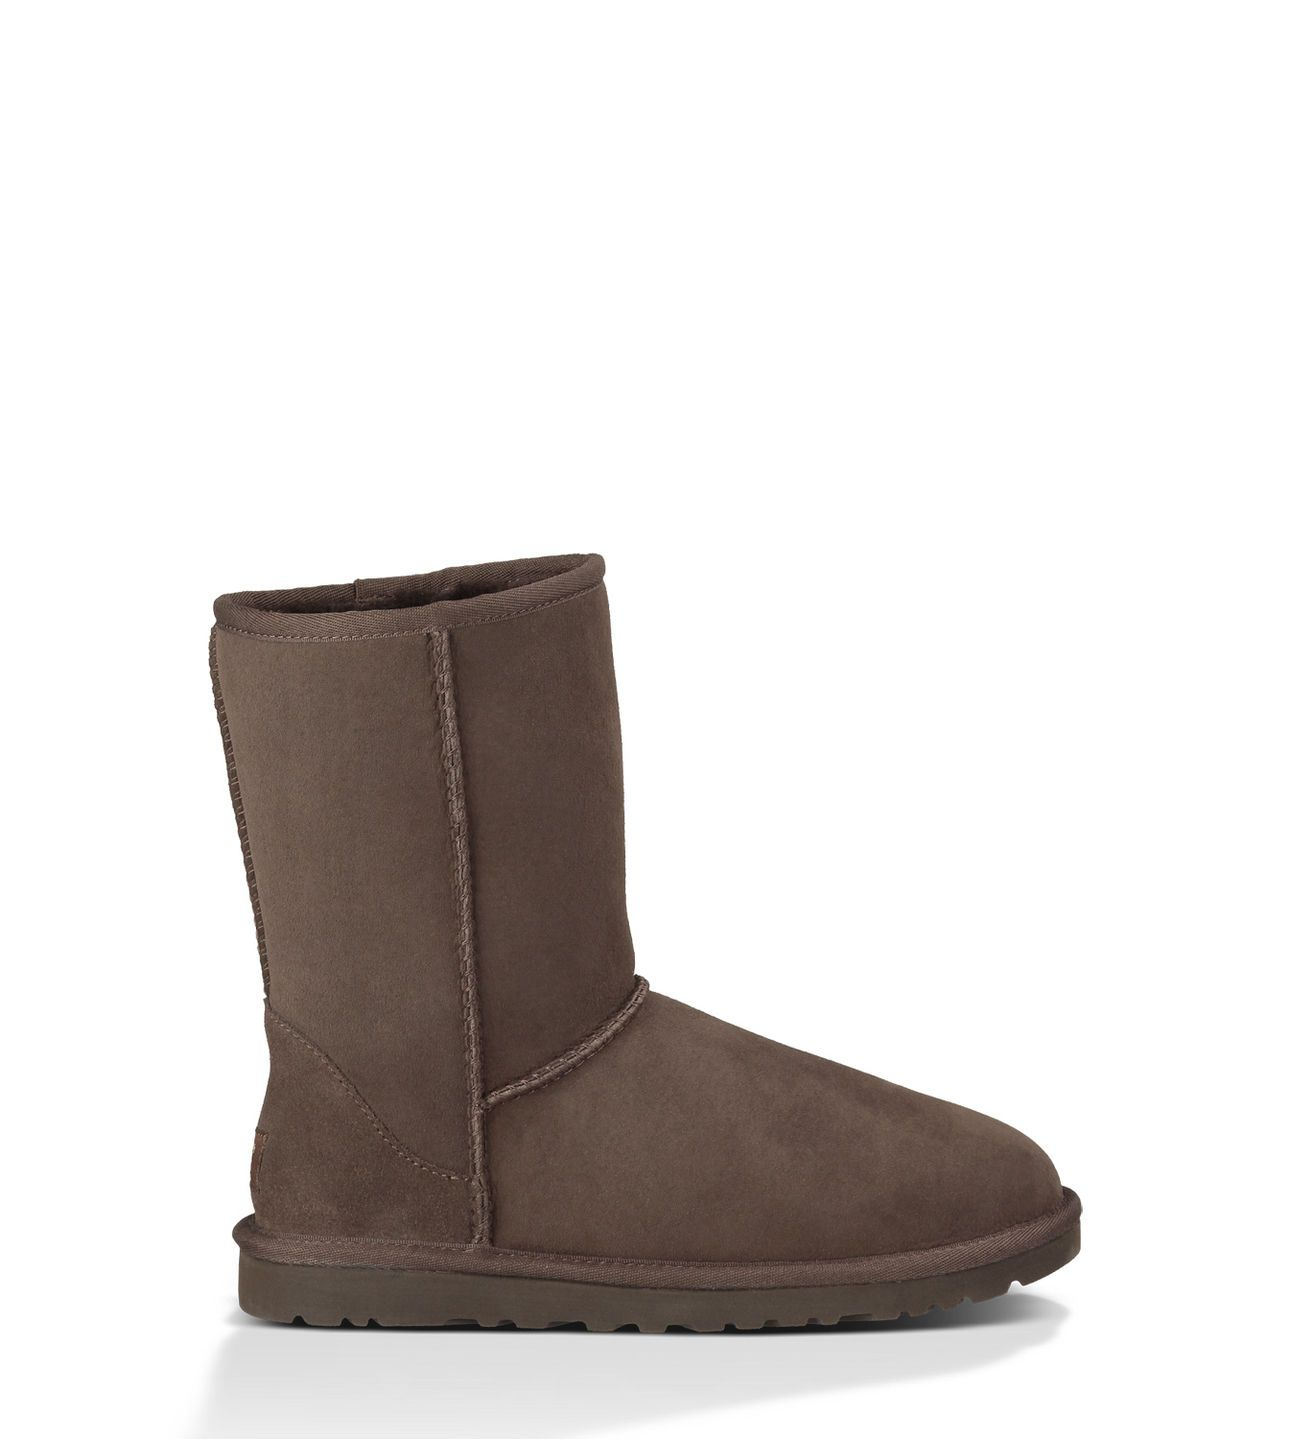 Ugg boots, Boots, Ugg classic short